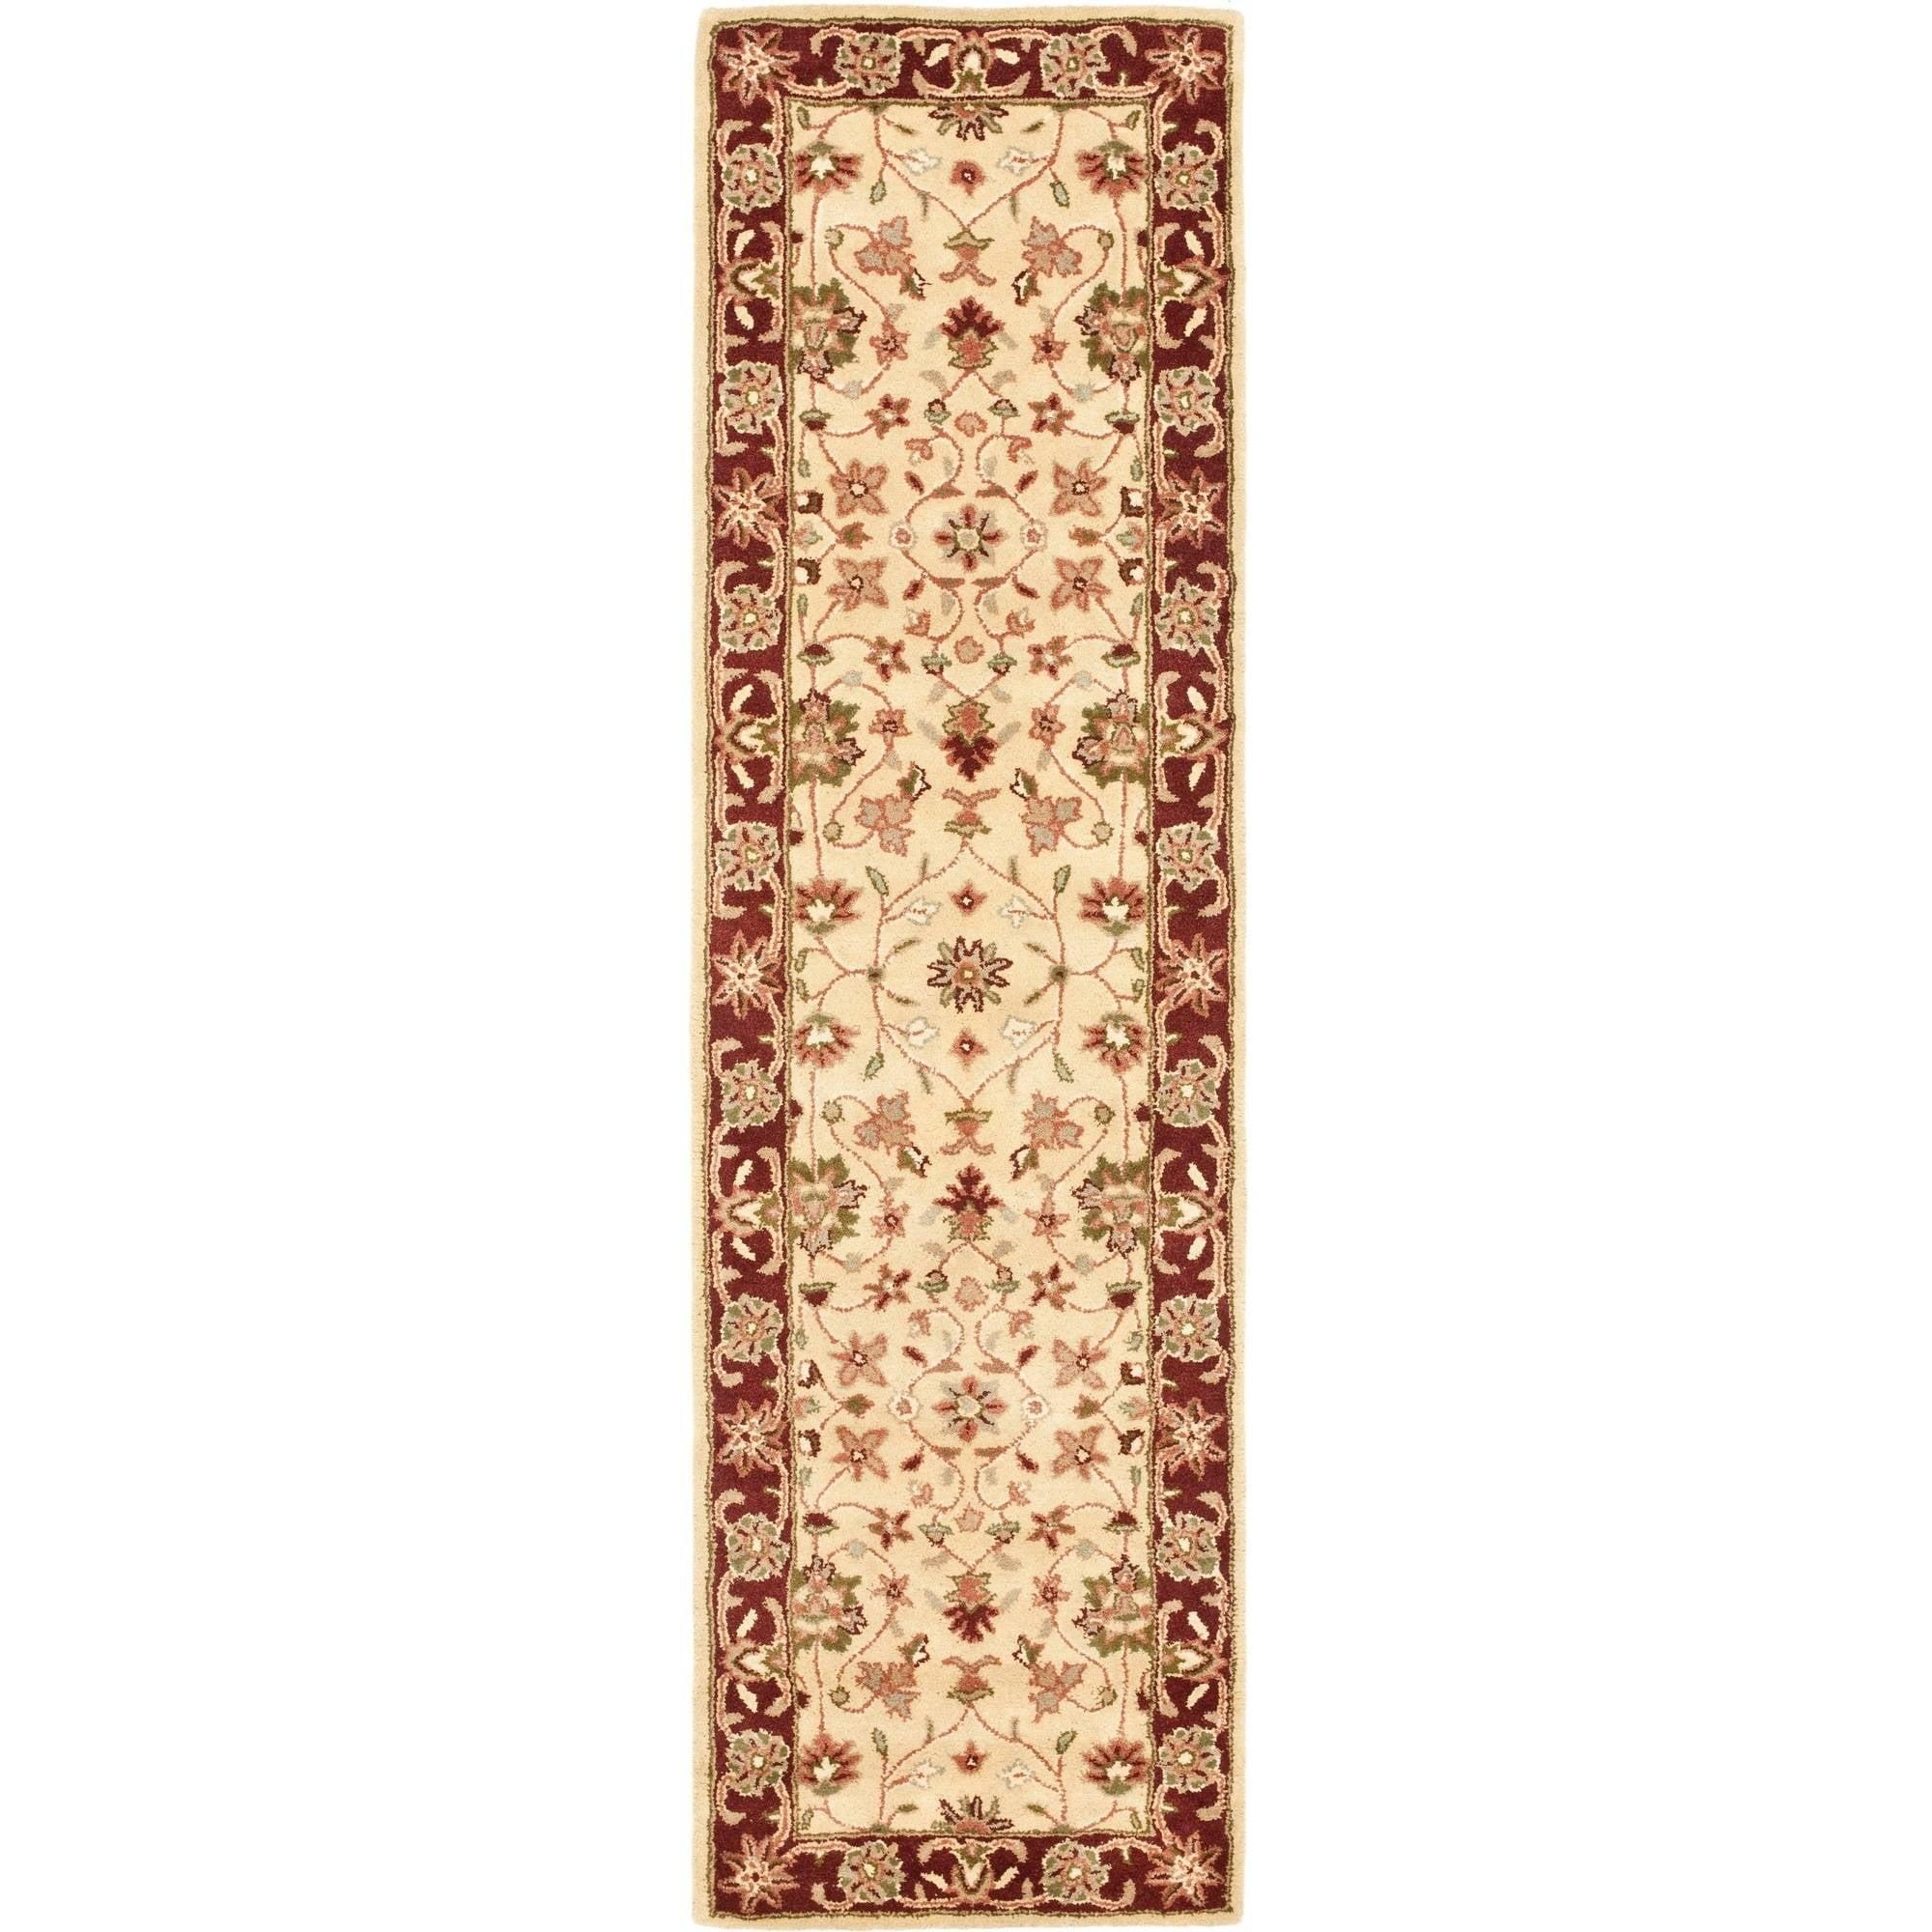 Safavieh Heritage Bernica Hand-Tufted Wool Runner Rug, Ivory/Red